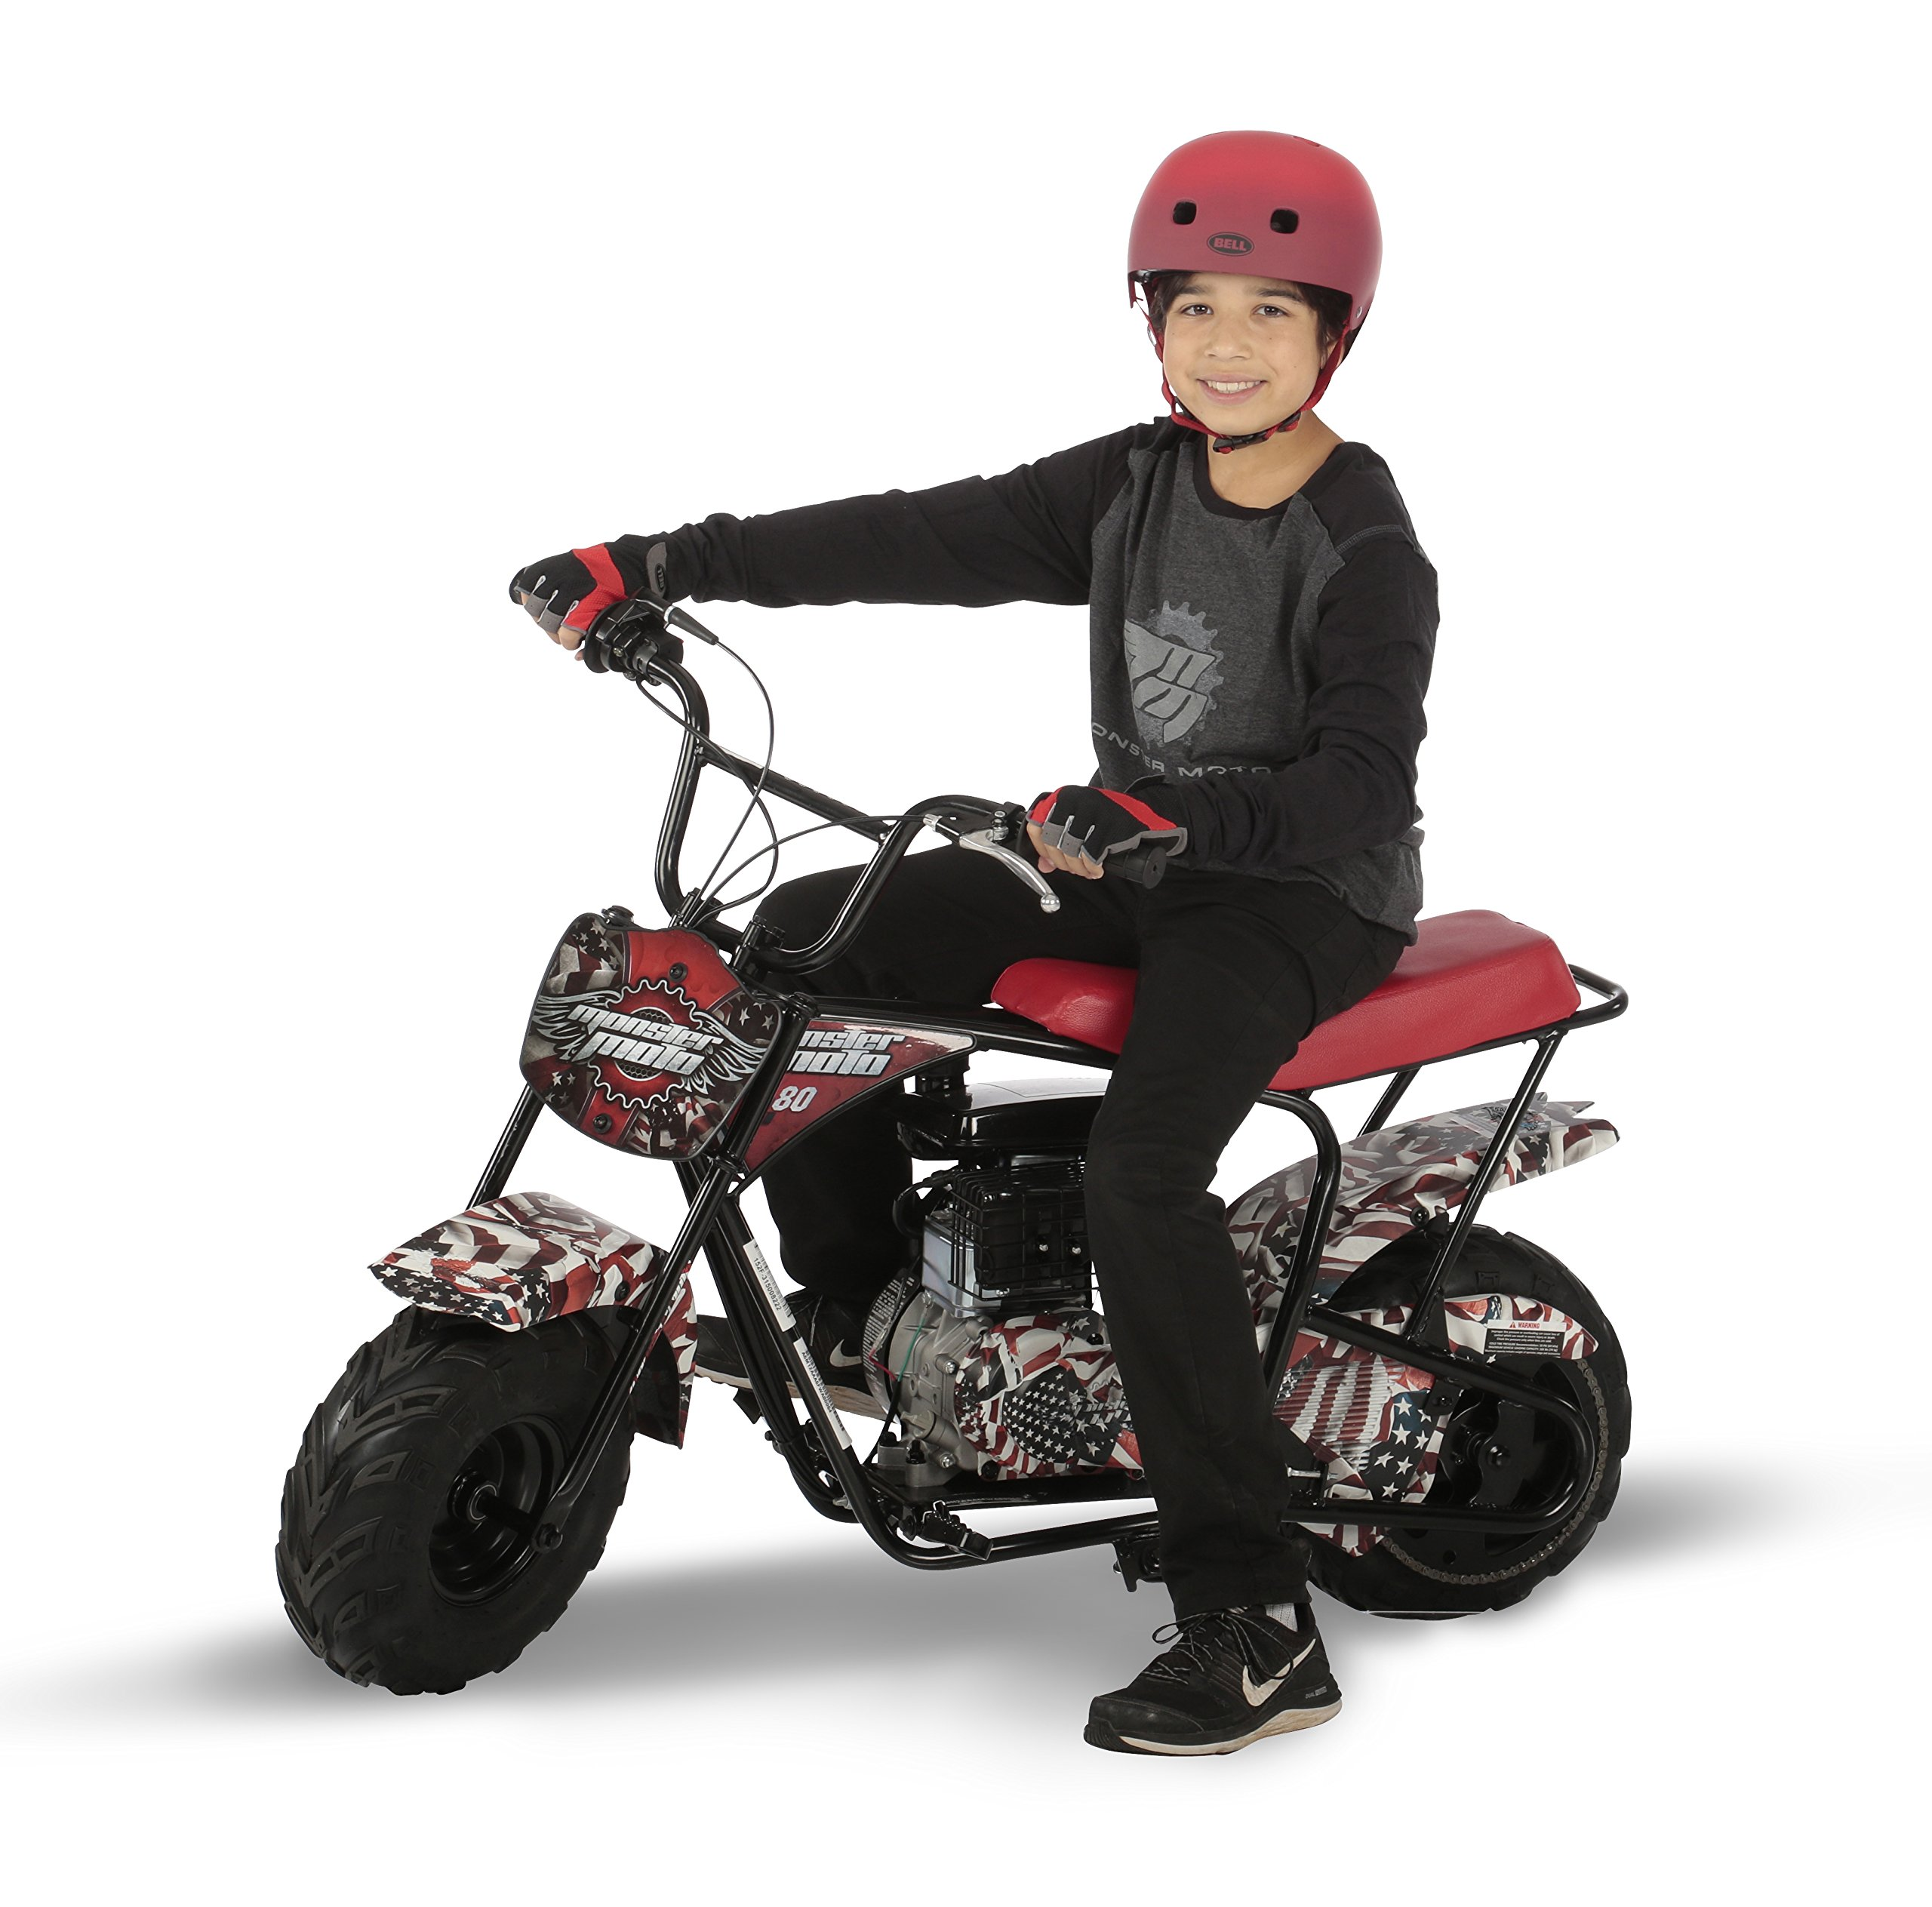 Monster Moto MM-B80-AF American Flag 80CC Youth Mini Bike - American Flag,1 Pack by Monster Moto (Image #3)